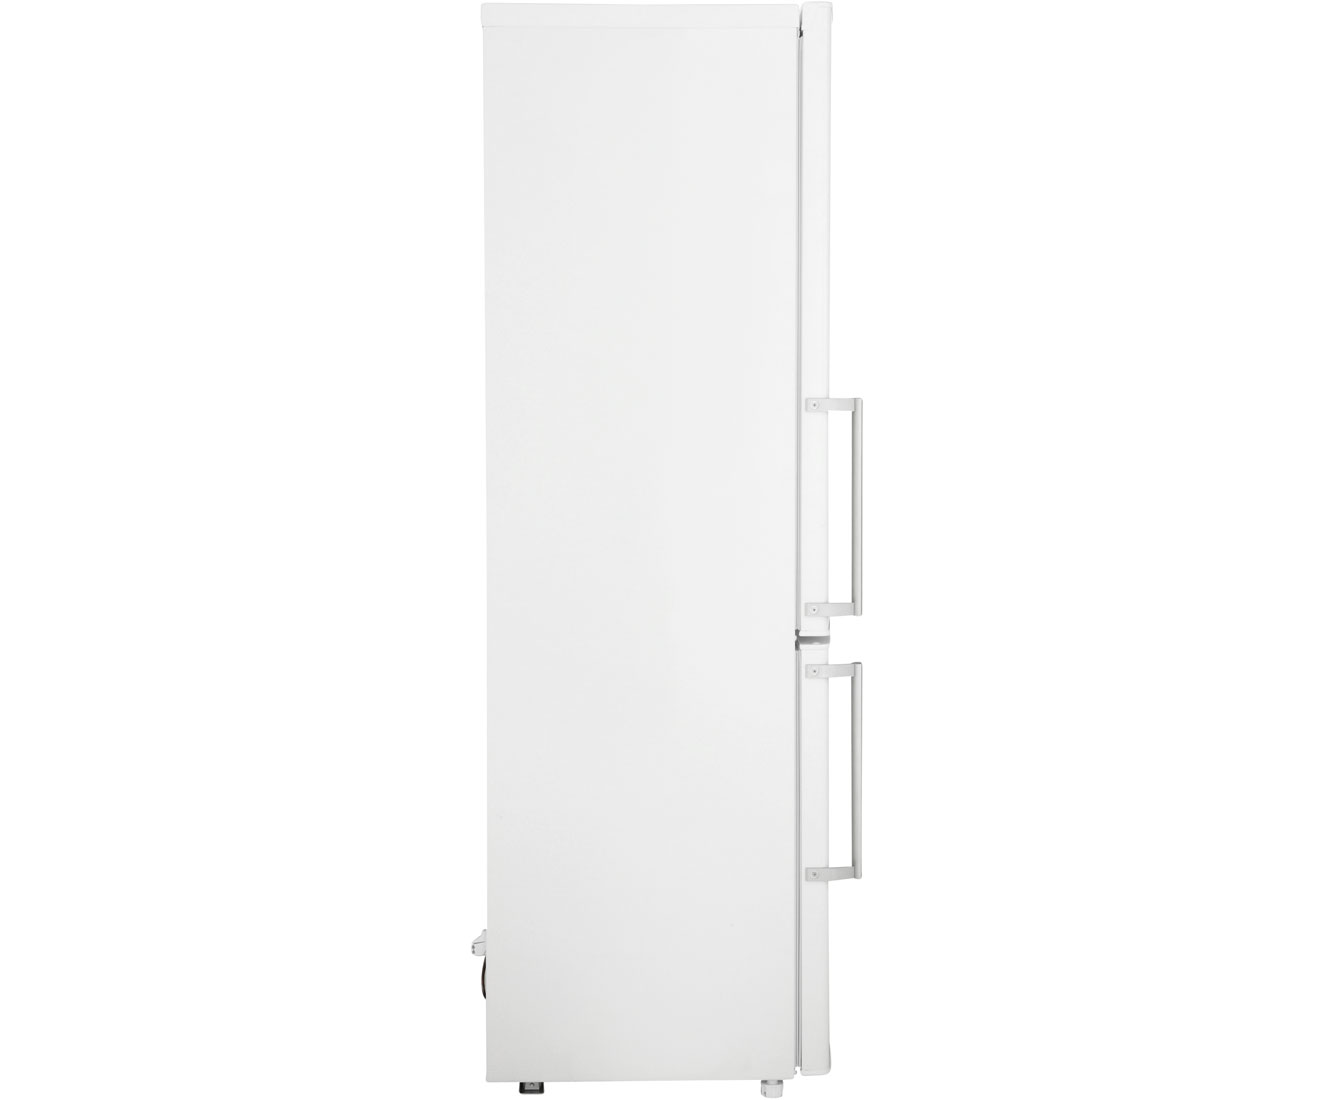 Amica Kühlschrank Türgriff : Amica kühlschrank türgriff kühlschrank haushaltsgeräte gebraucht